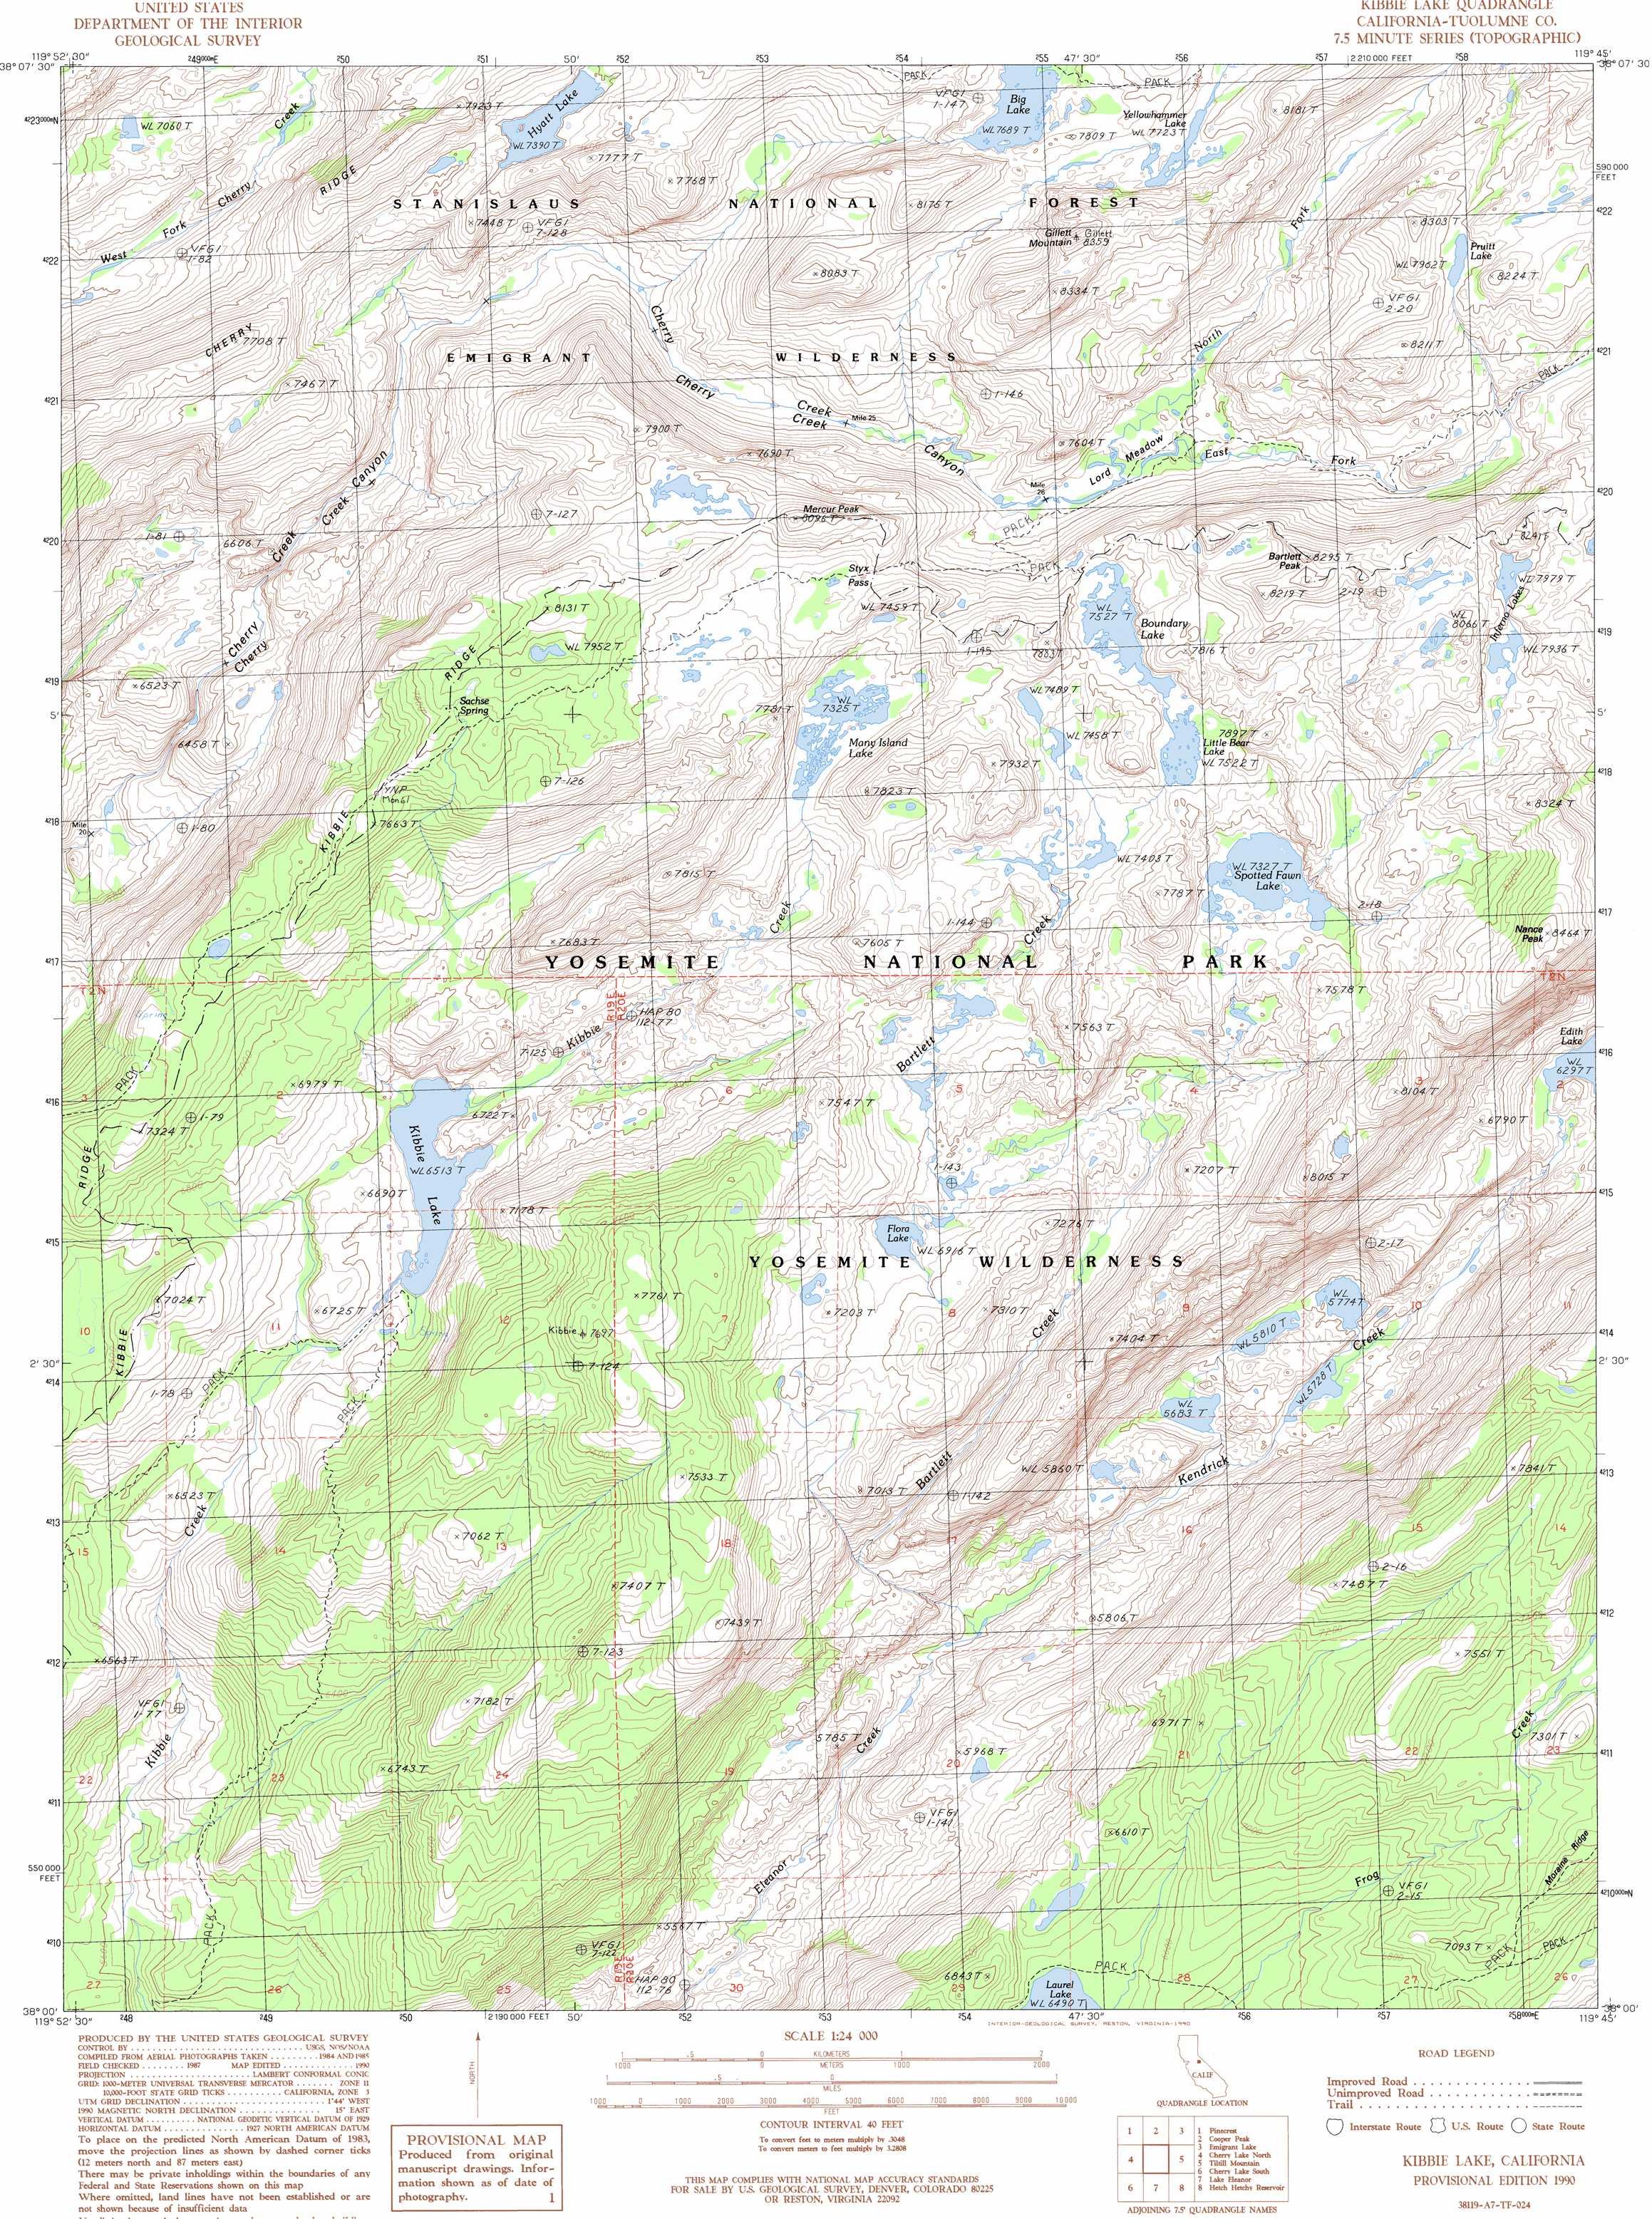 Kibbie Lake topographic map CA USGS Topo Quad 38119a7